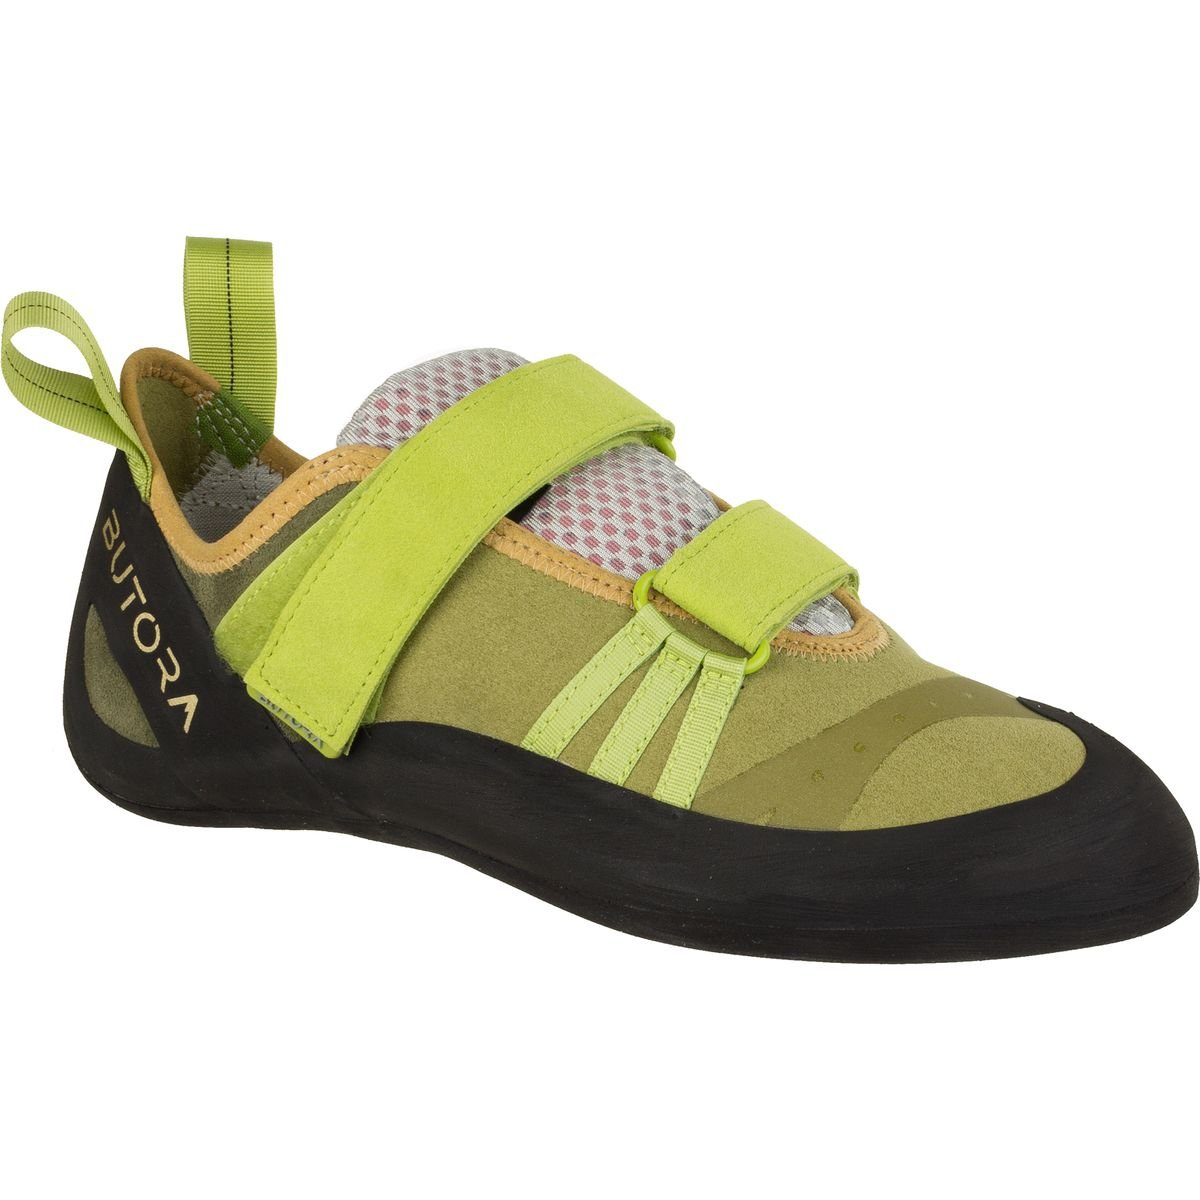 Butora Endeavor Wide Fit Climbing Shoe - Men's